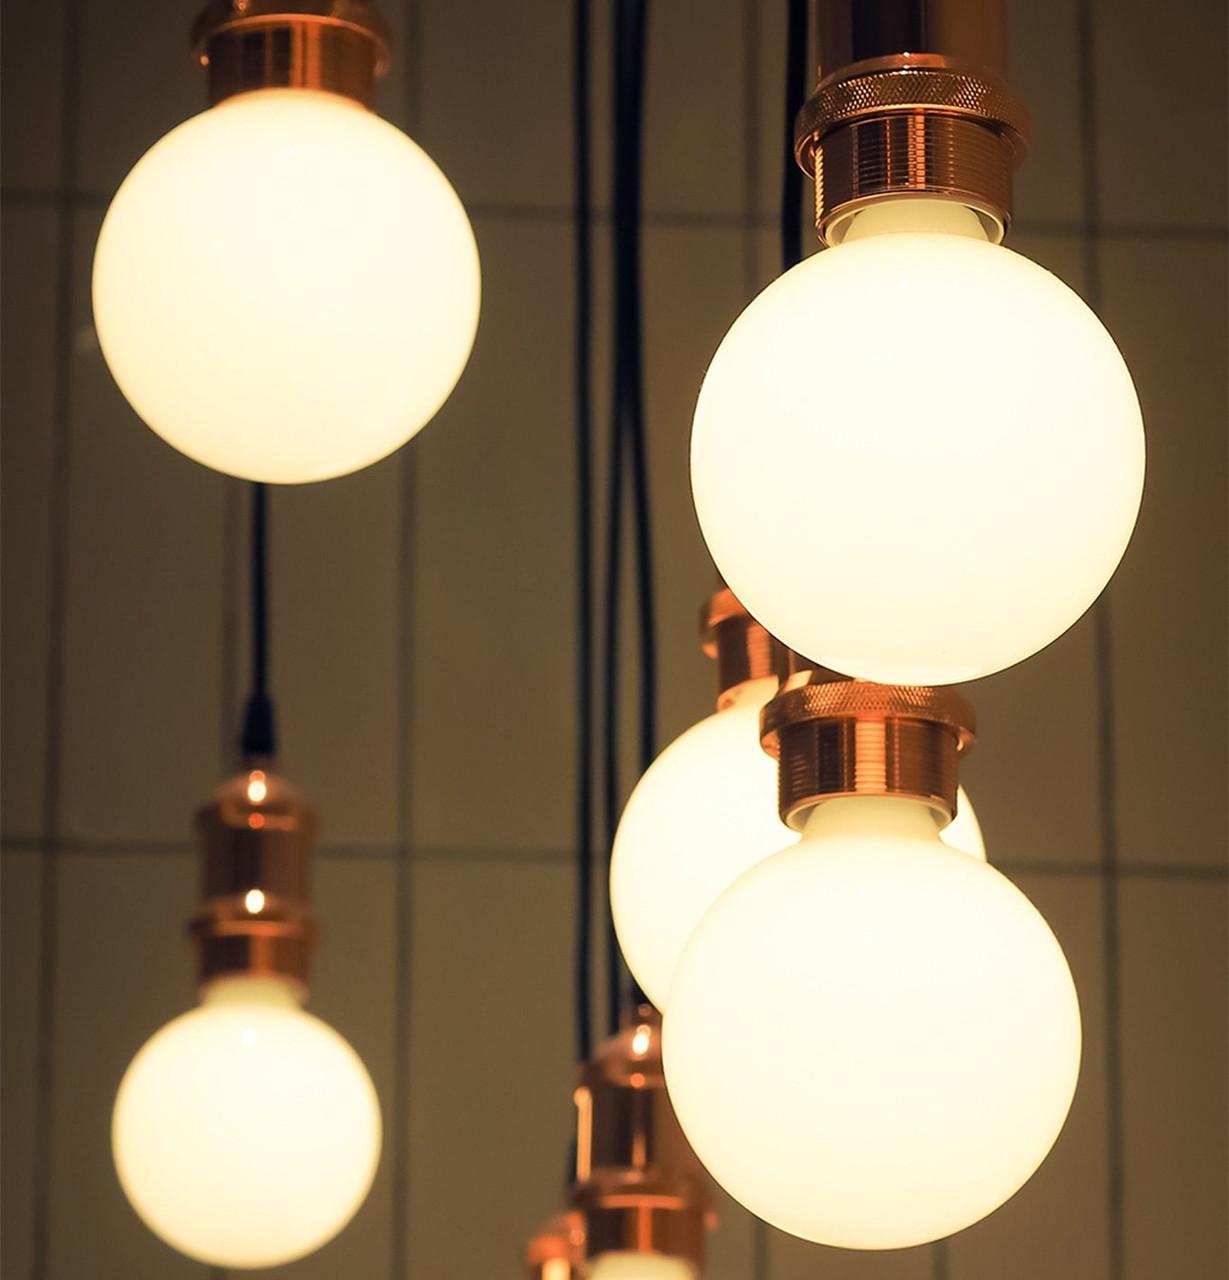 LED G95 ES-E27 Light Bulbs